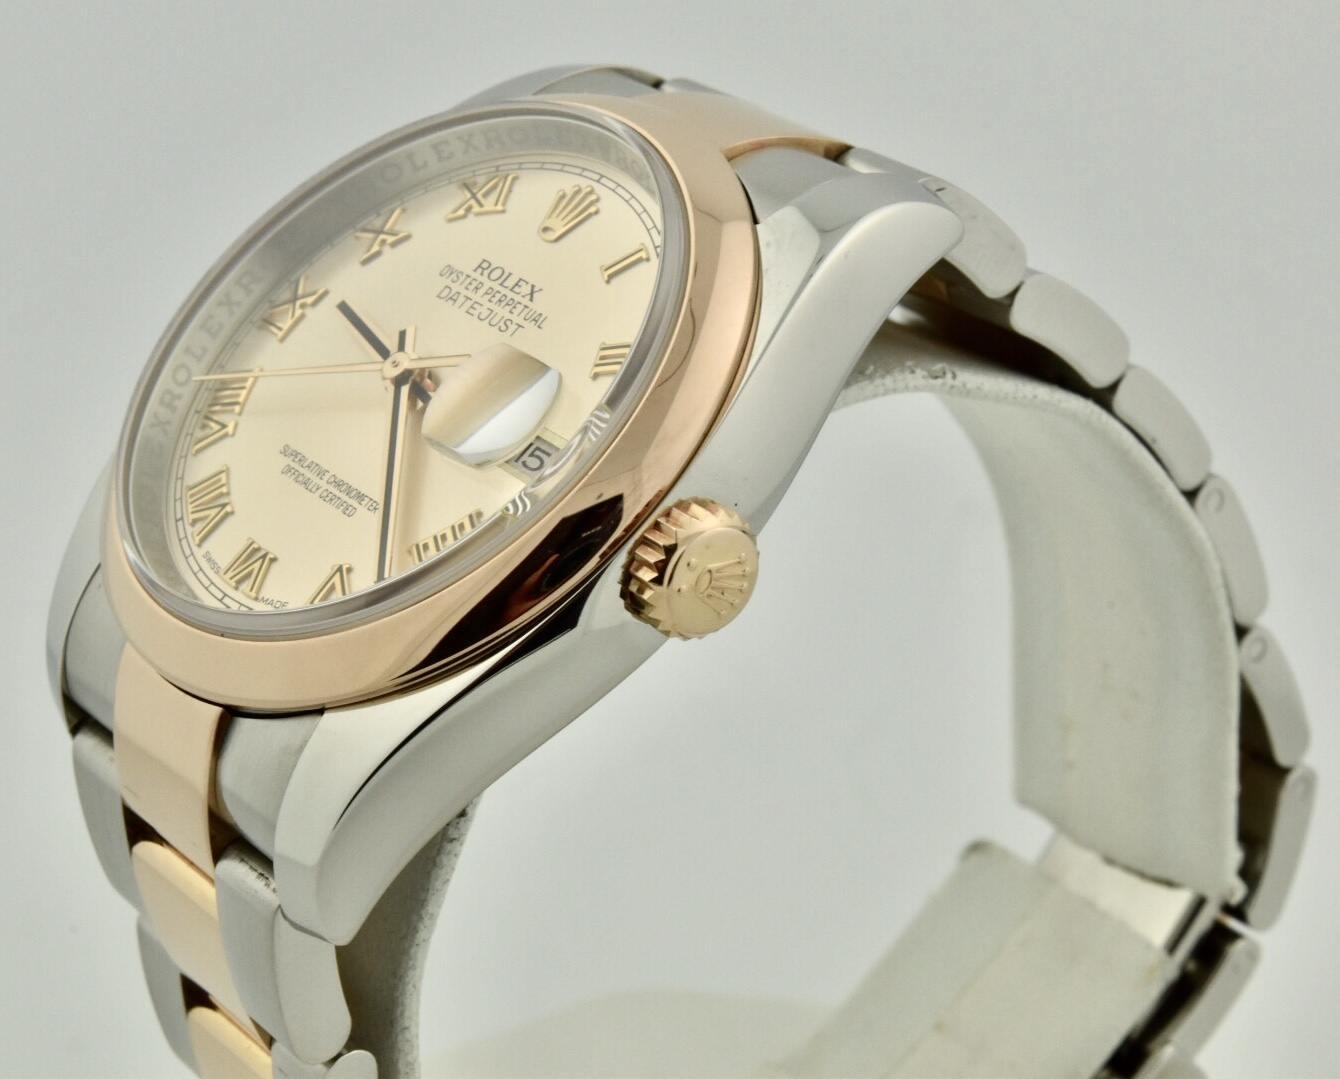 IMG 7995 - Rolex Datejust 36mm